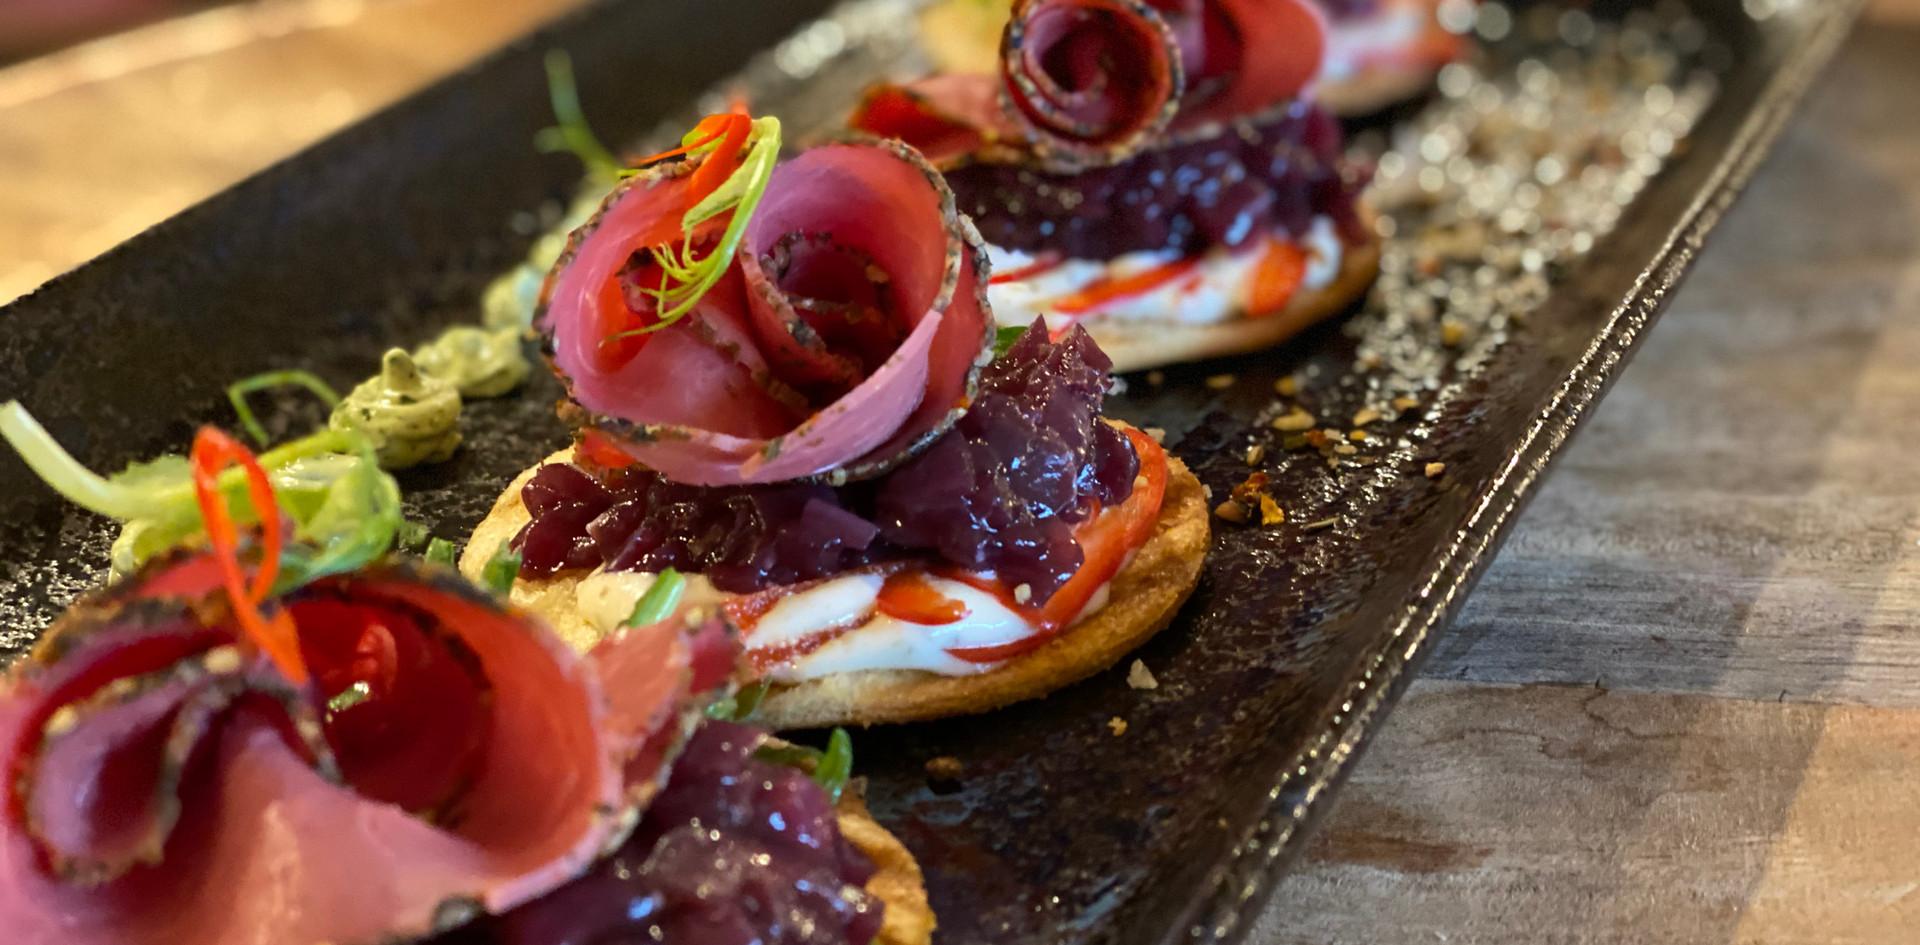 Vorspeise Restaurant Dinner - Hotel Wegner - The culinary Art Hotel